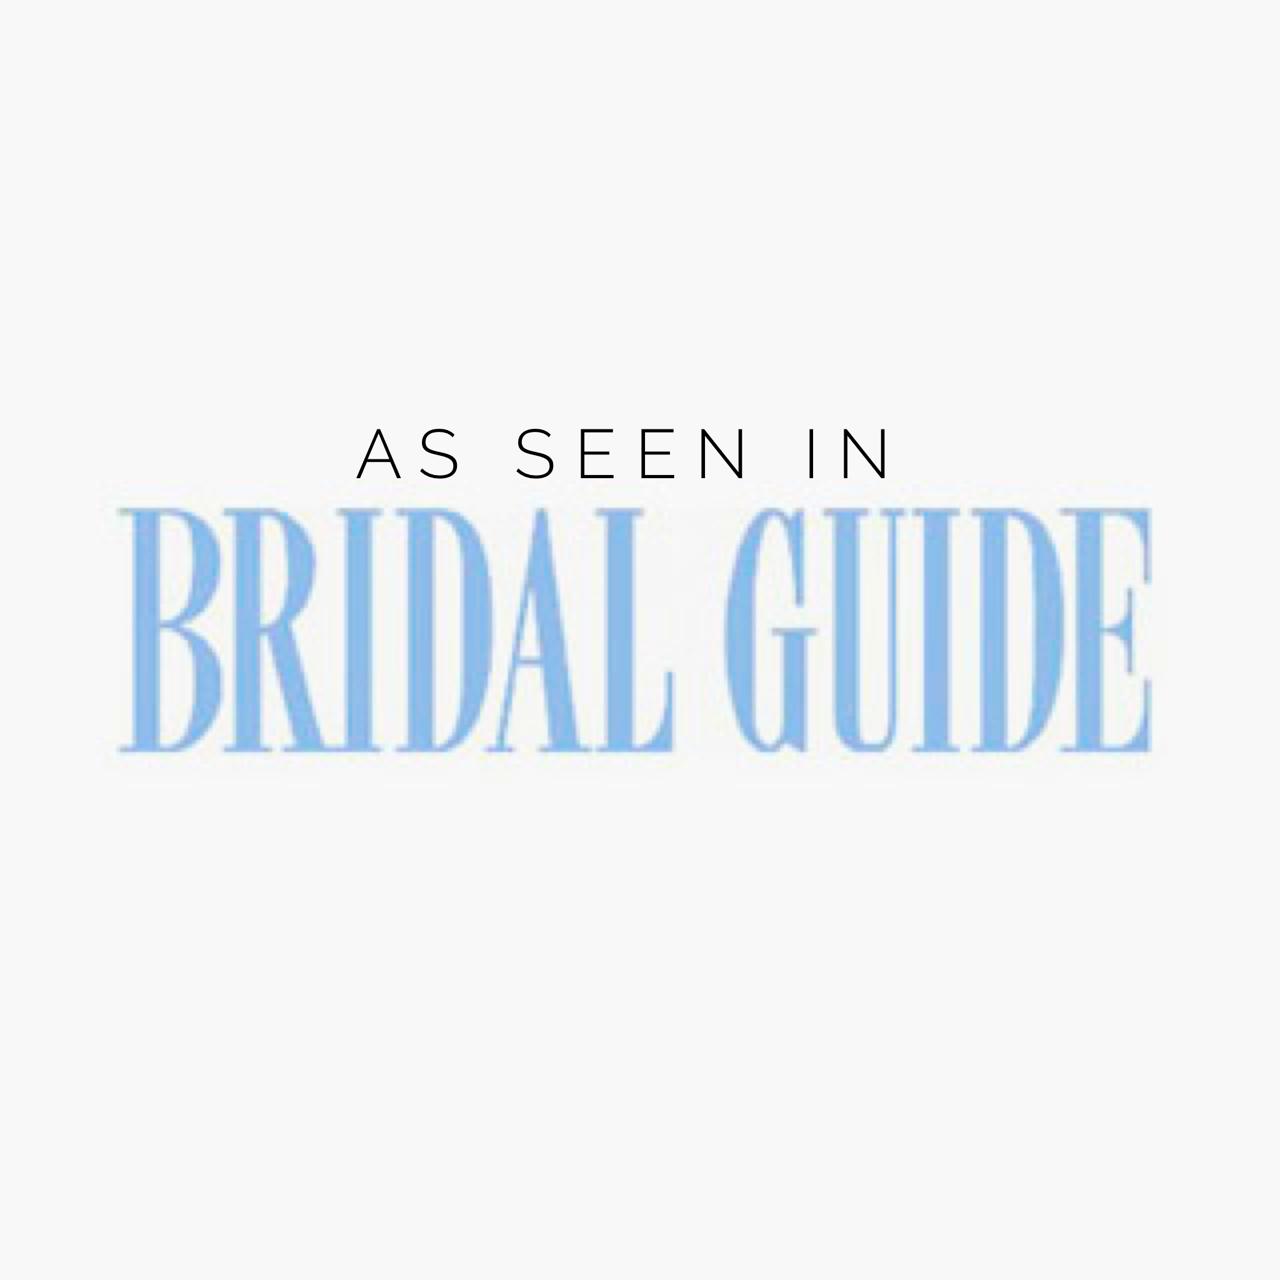 Bridal Guide.PNG